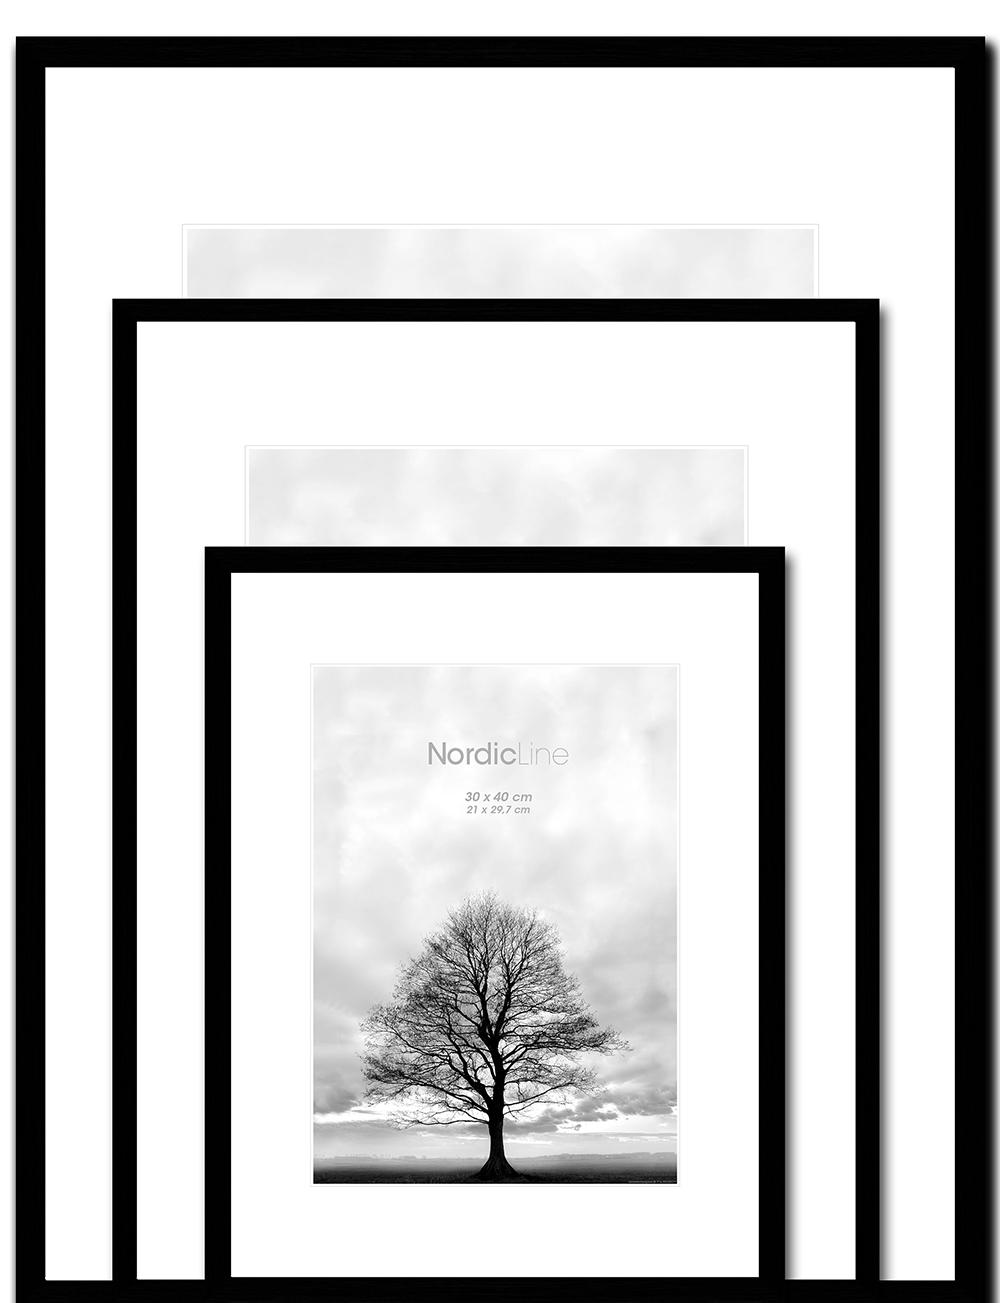 Artframe - Nordic Line - Slim Black - INCADO